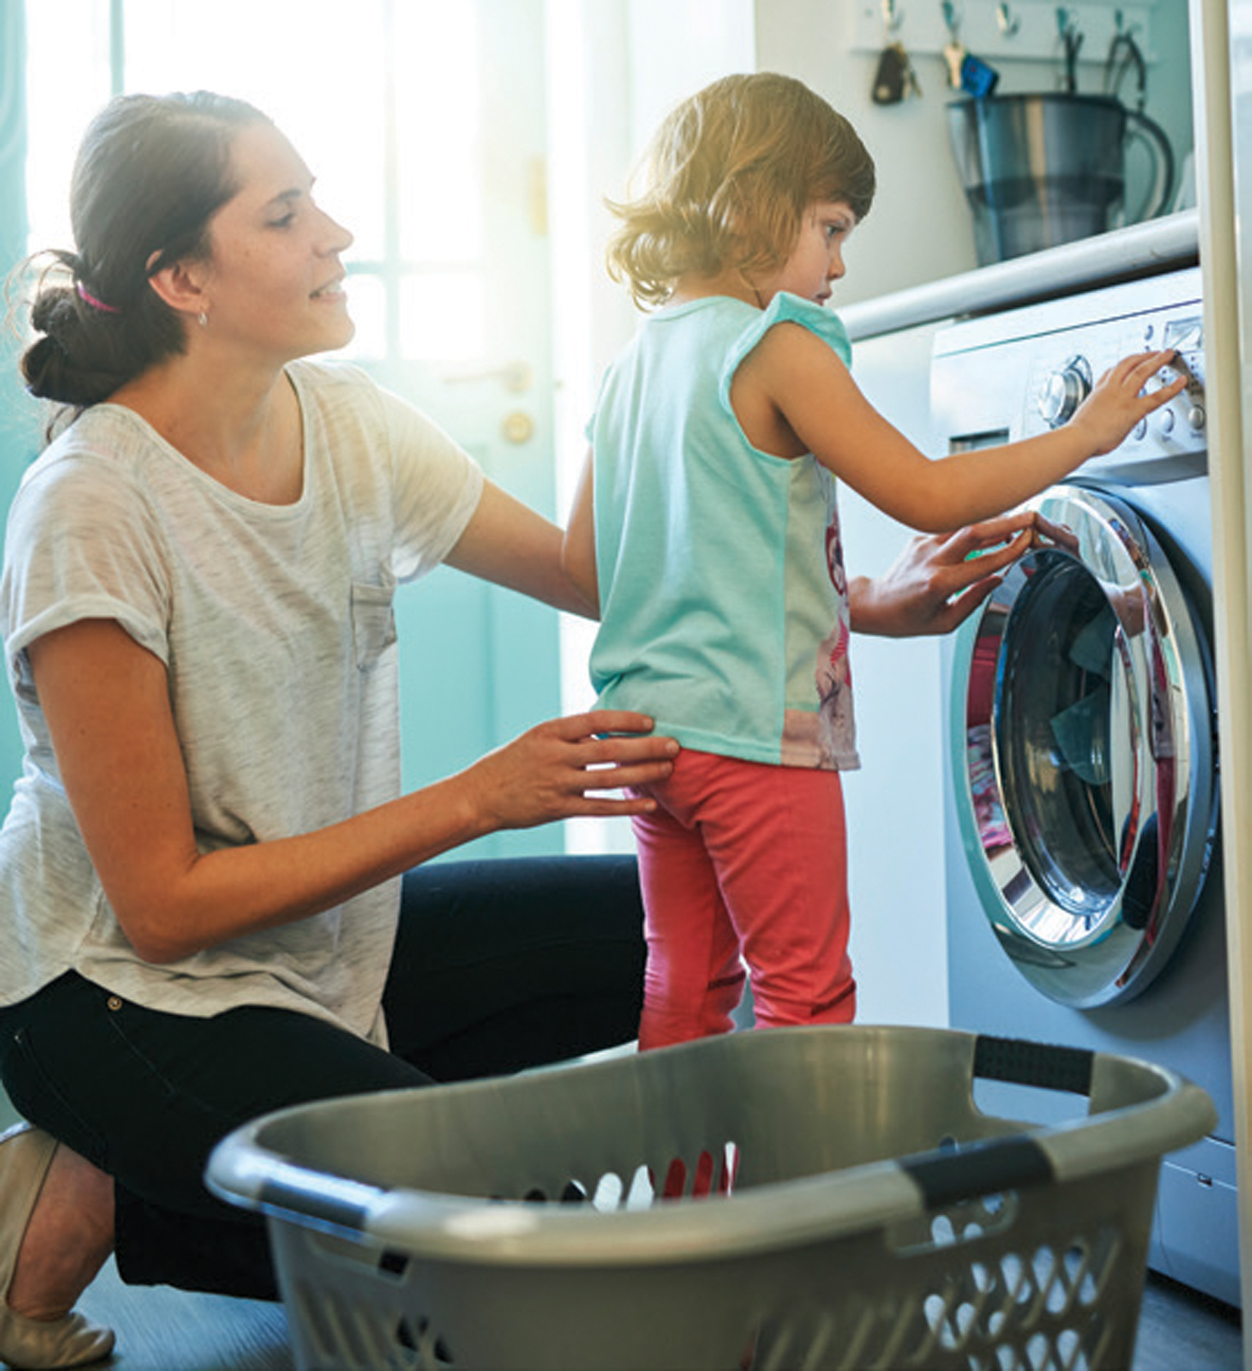 LaundryRoom_c